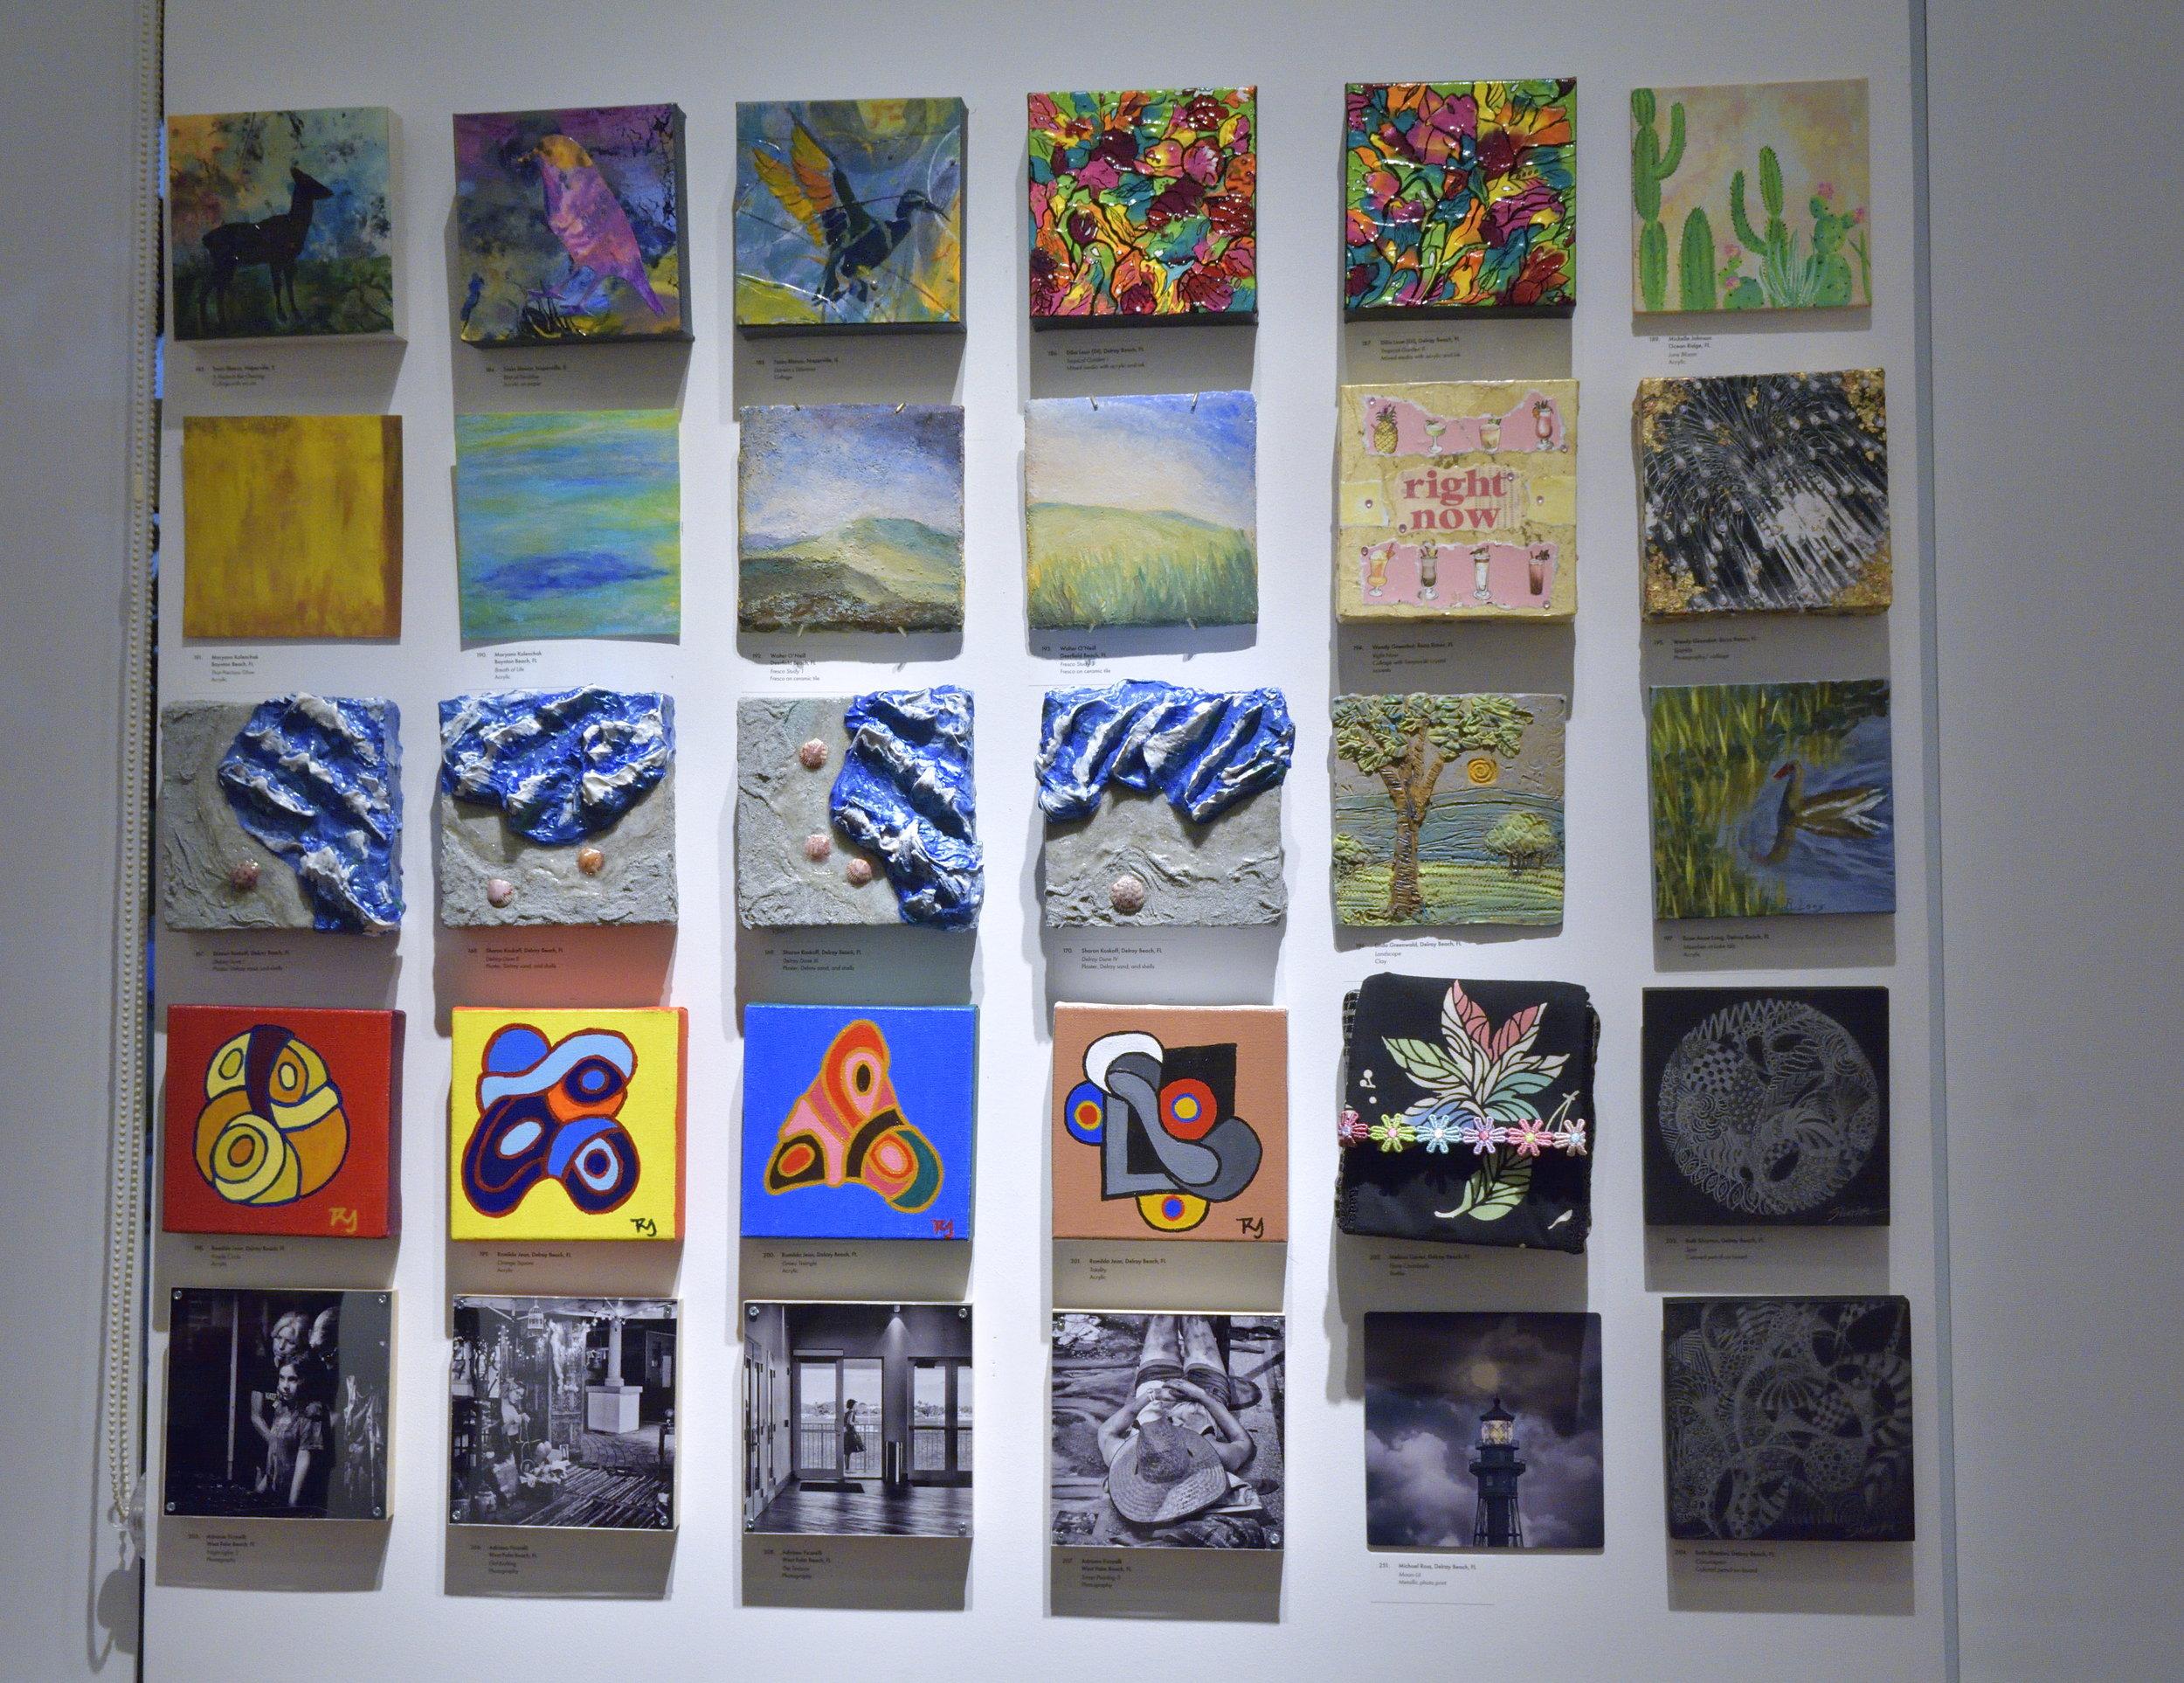 6X6_Exhibition_2018__18.jpg